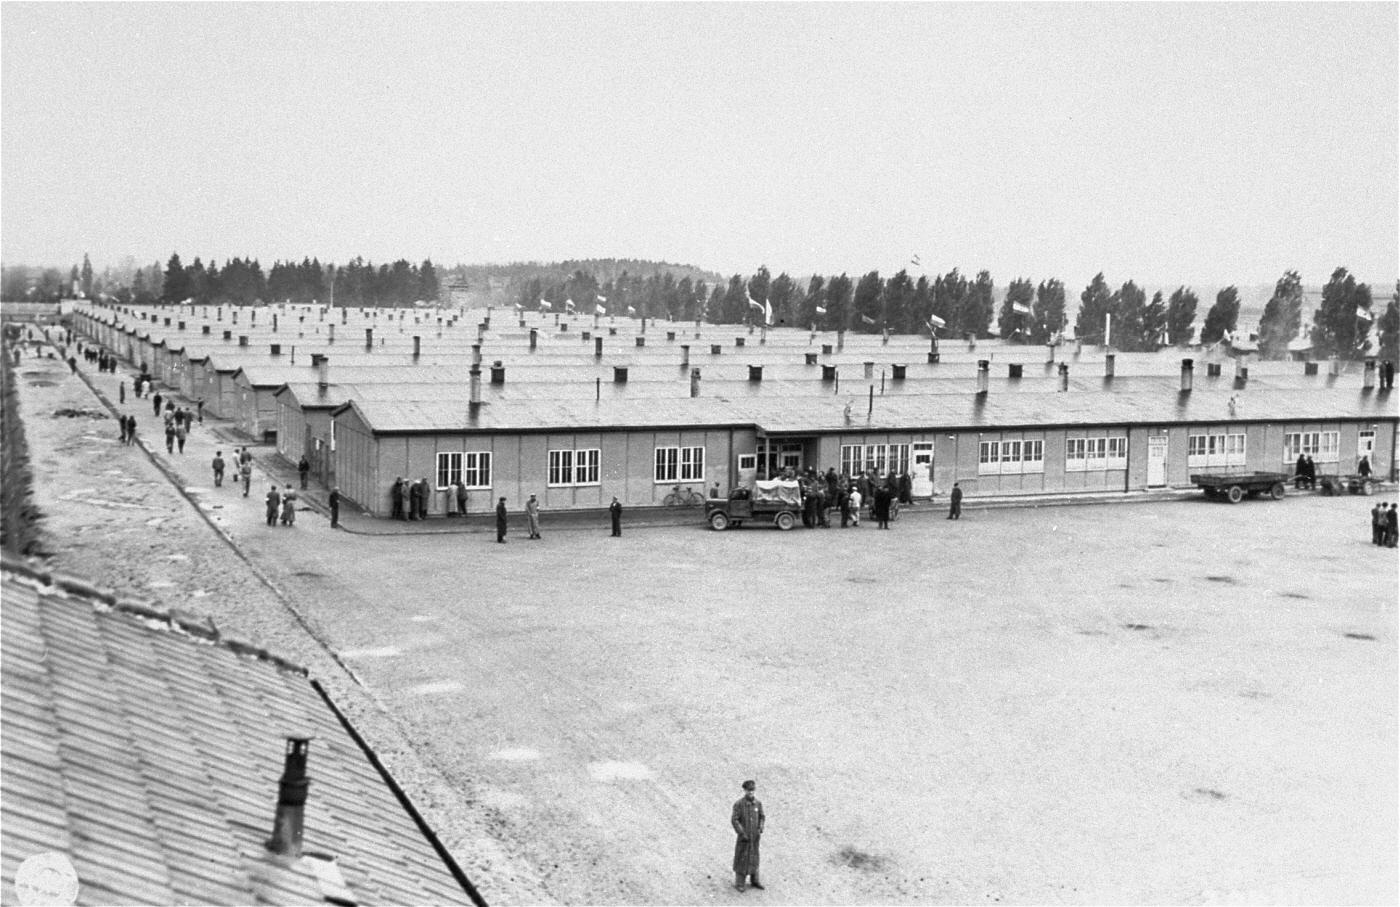 Prisoner's_barracks_dachau